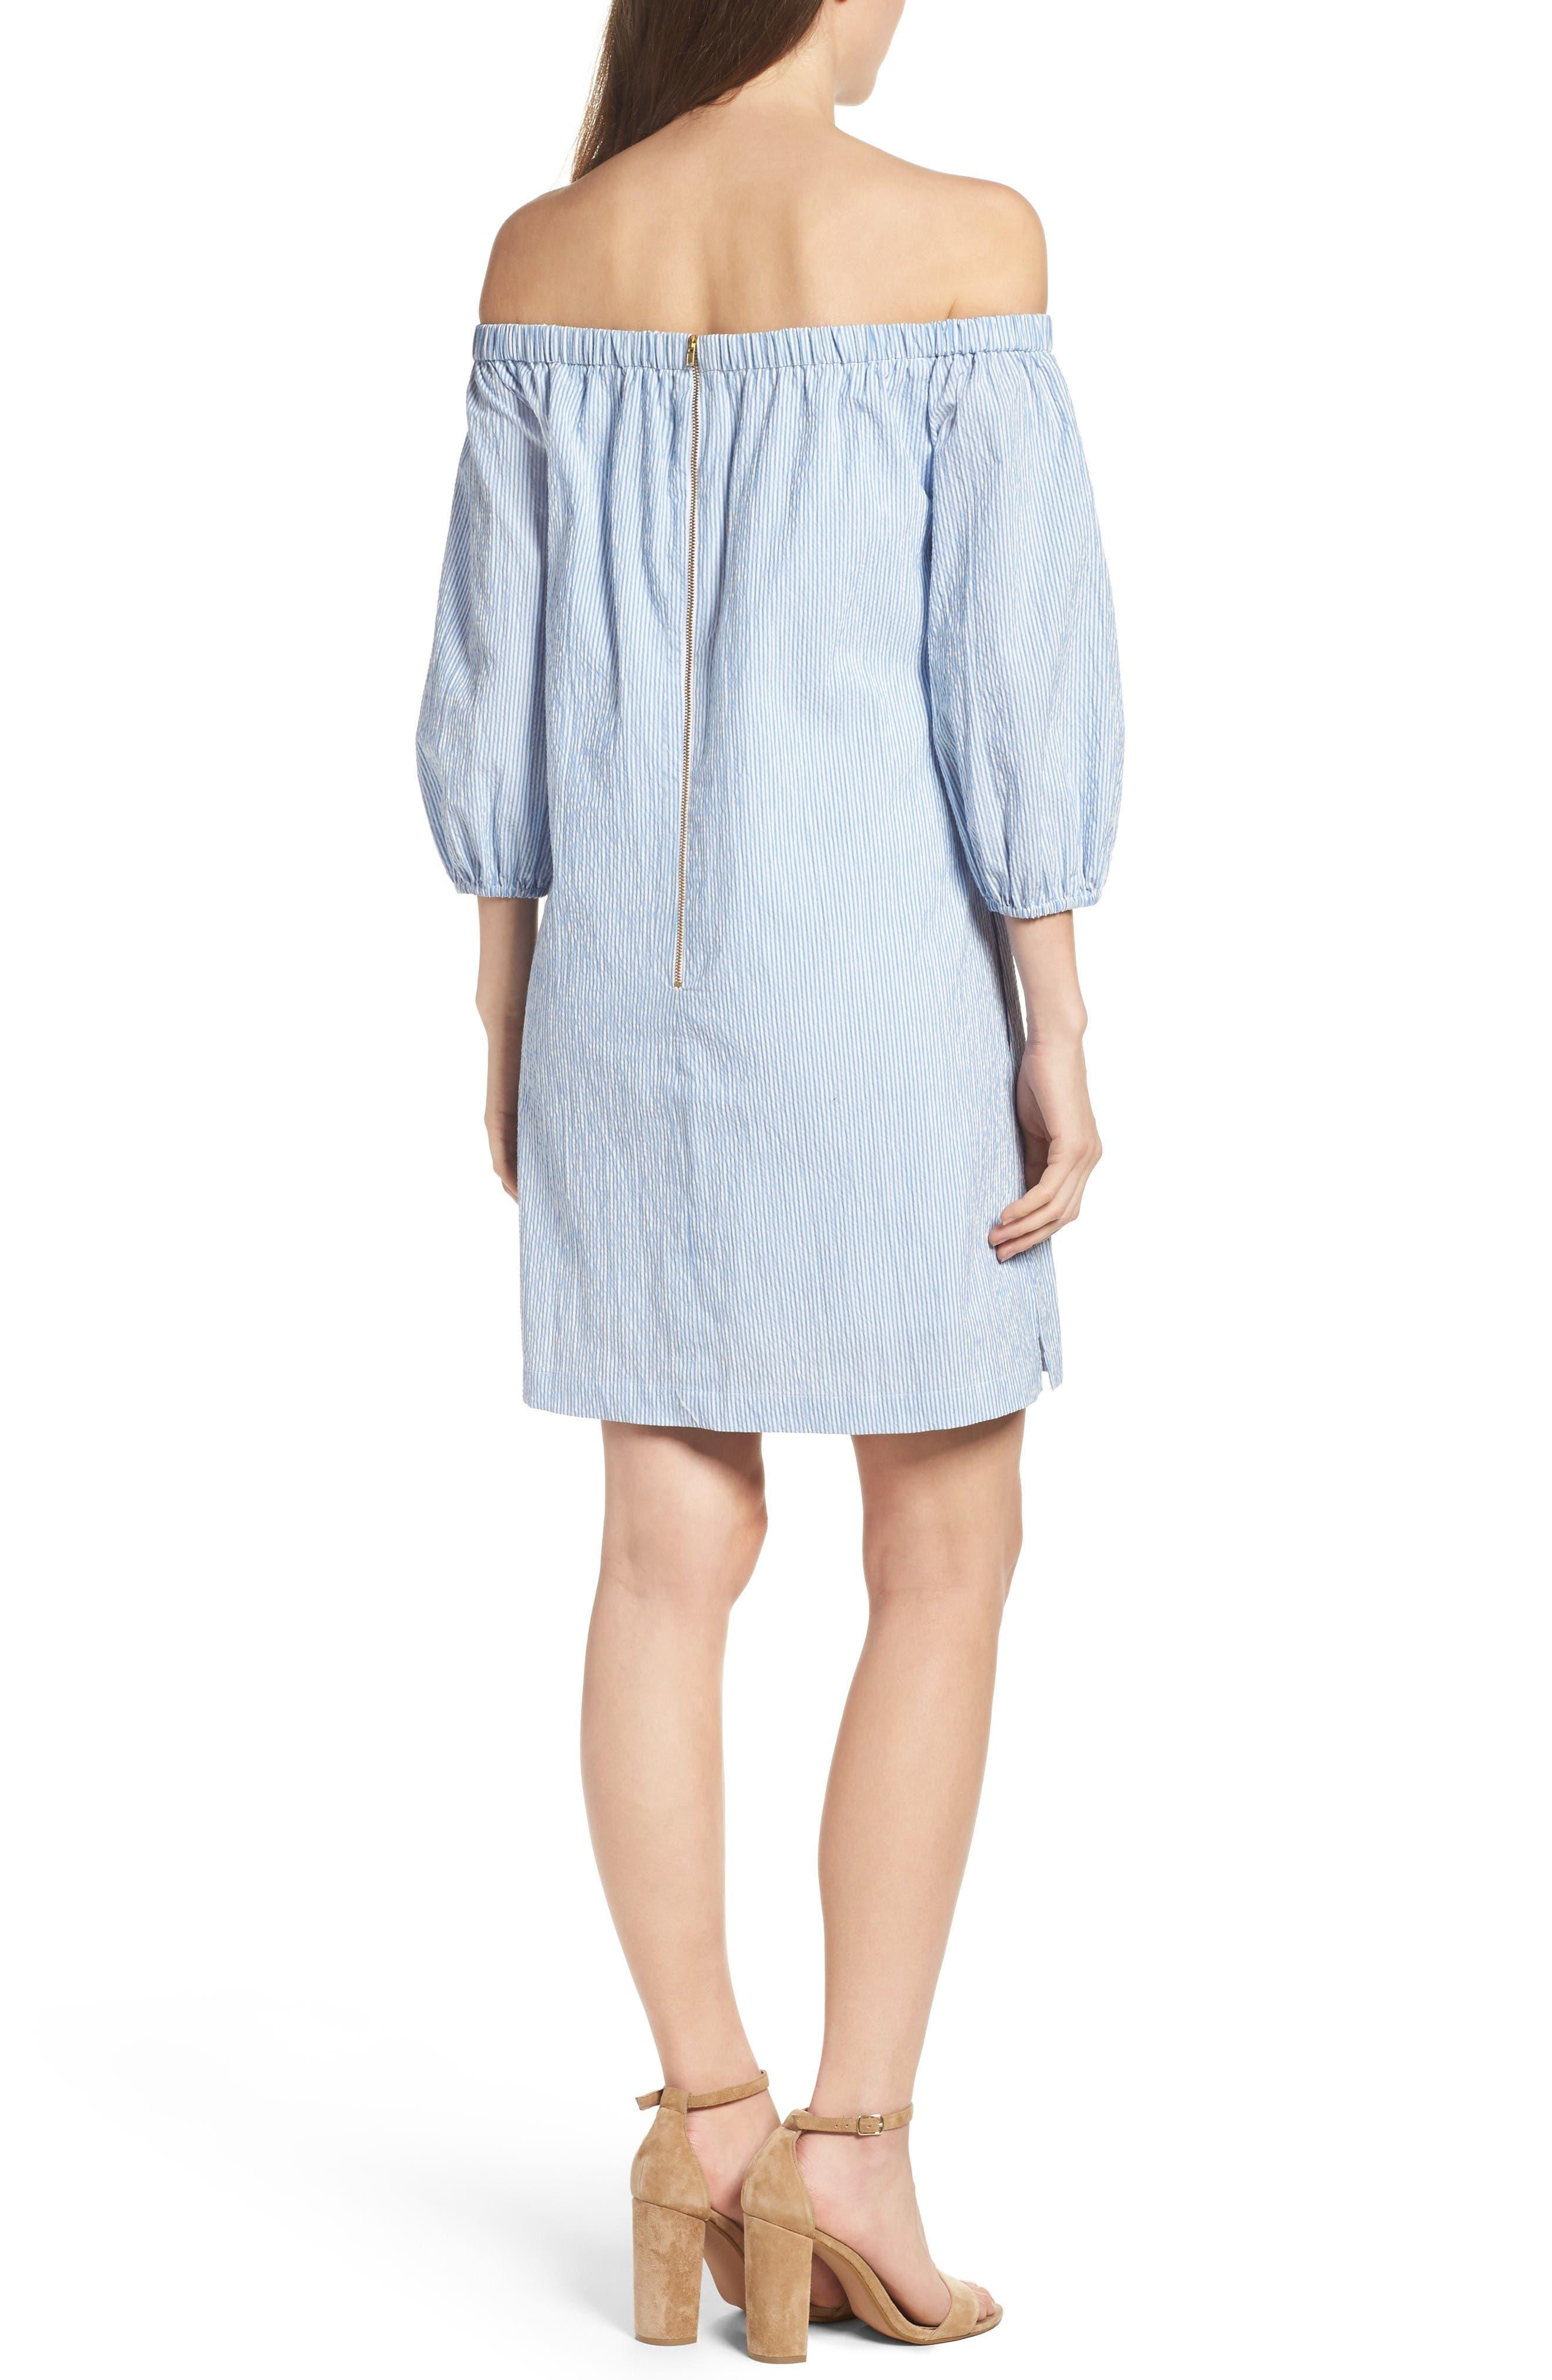 Alternate Image 3  - Eliza J Lace Trim Seersucker Off the Shoulder Dress (Regular & Petite)